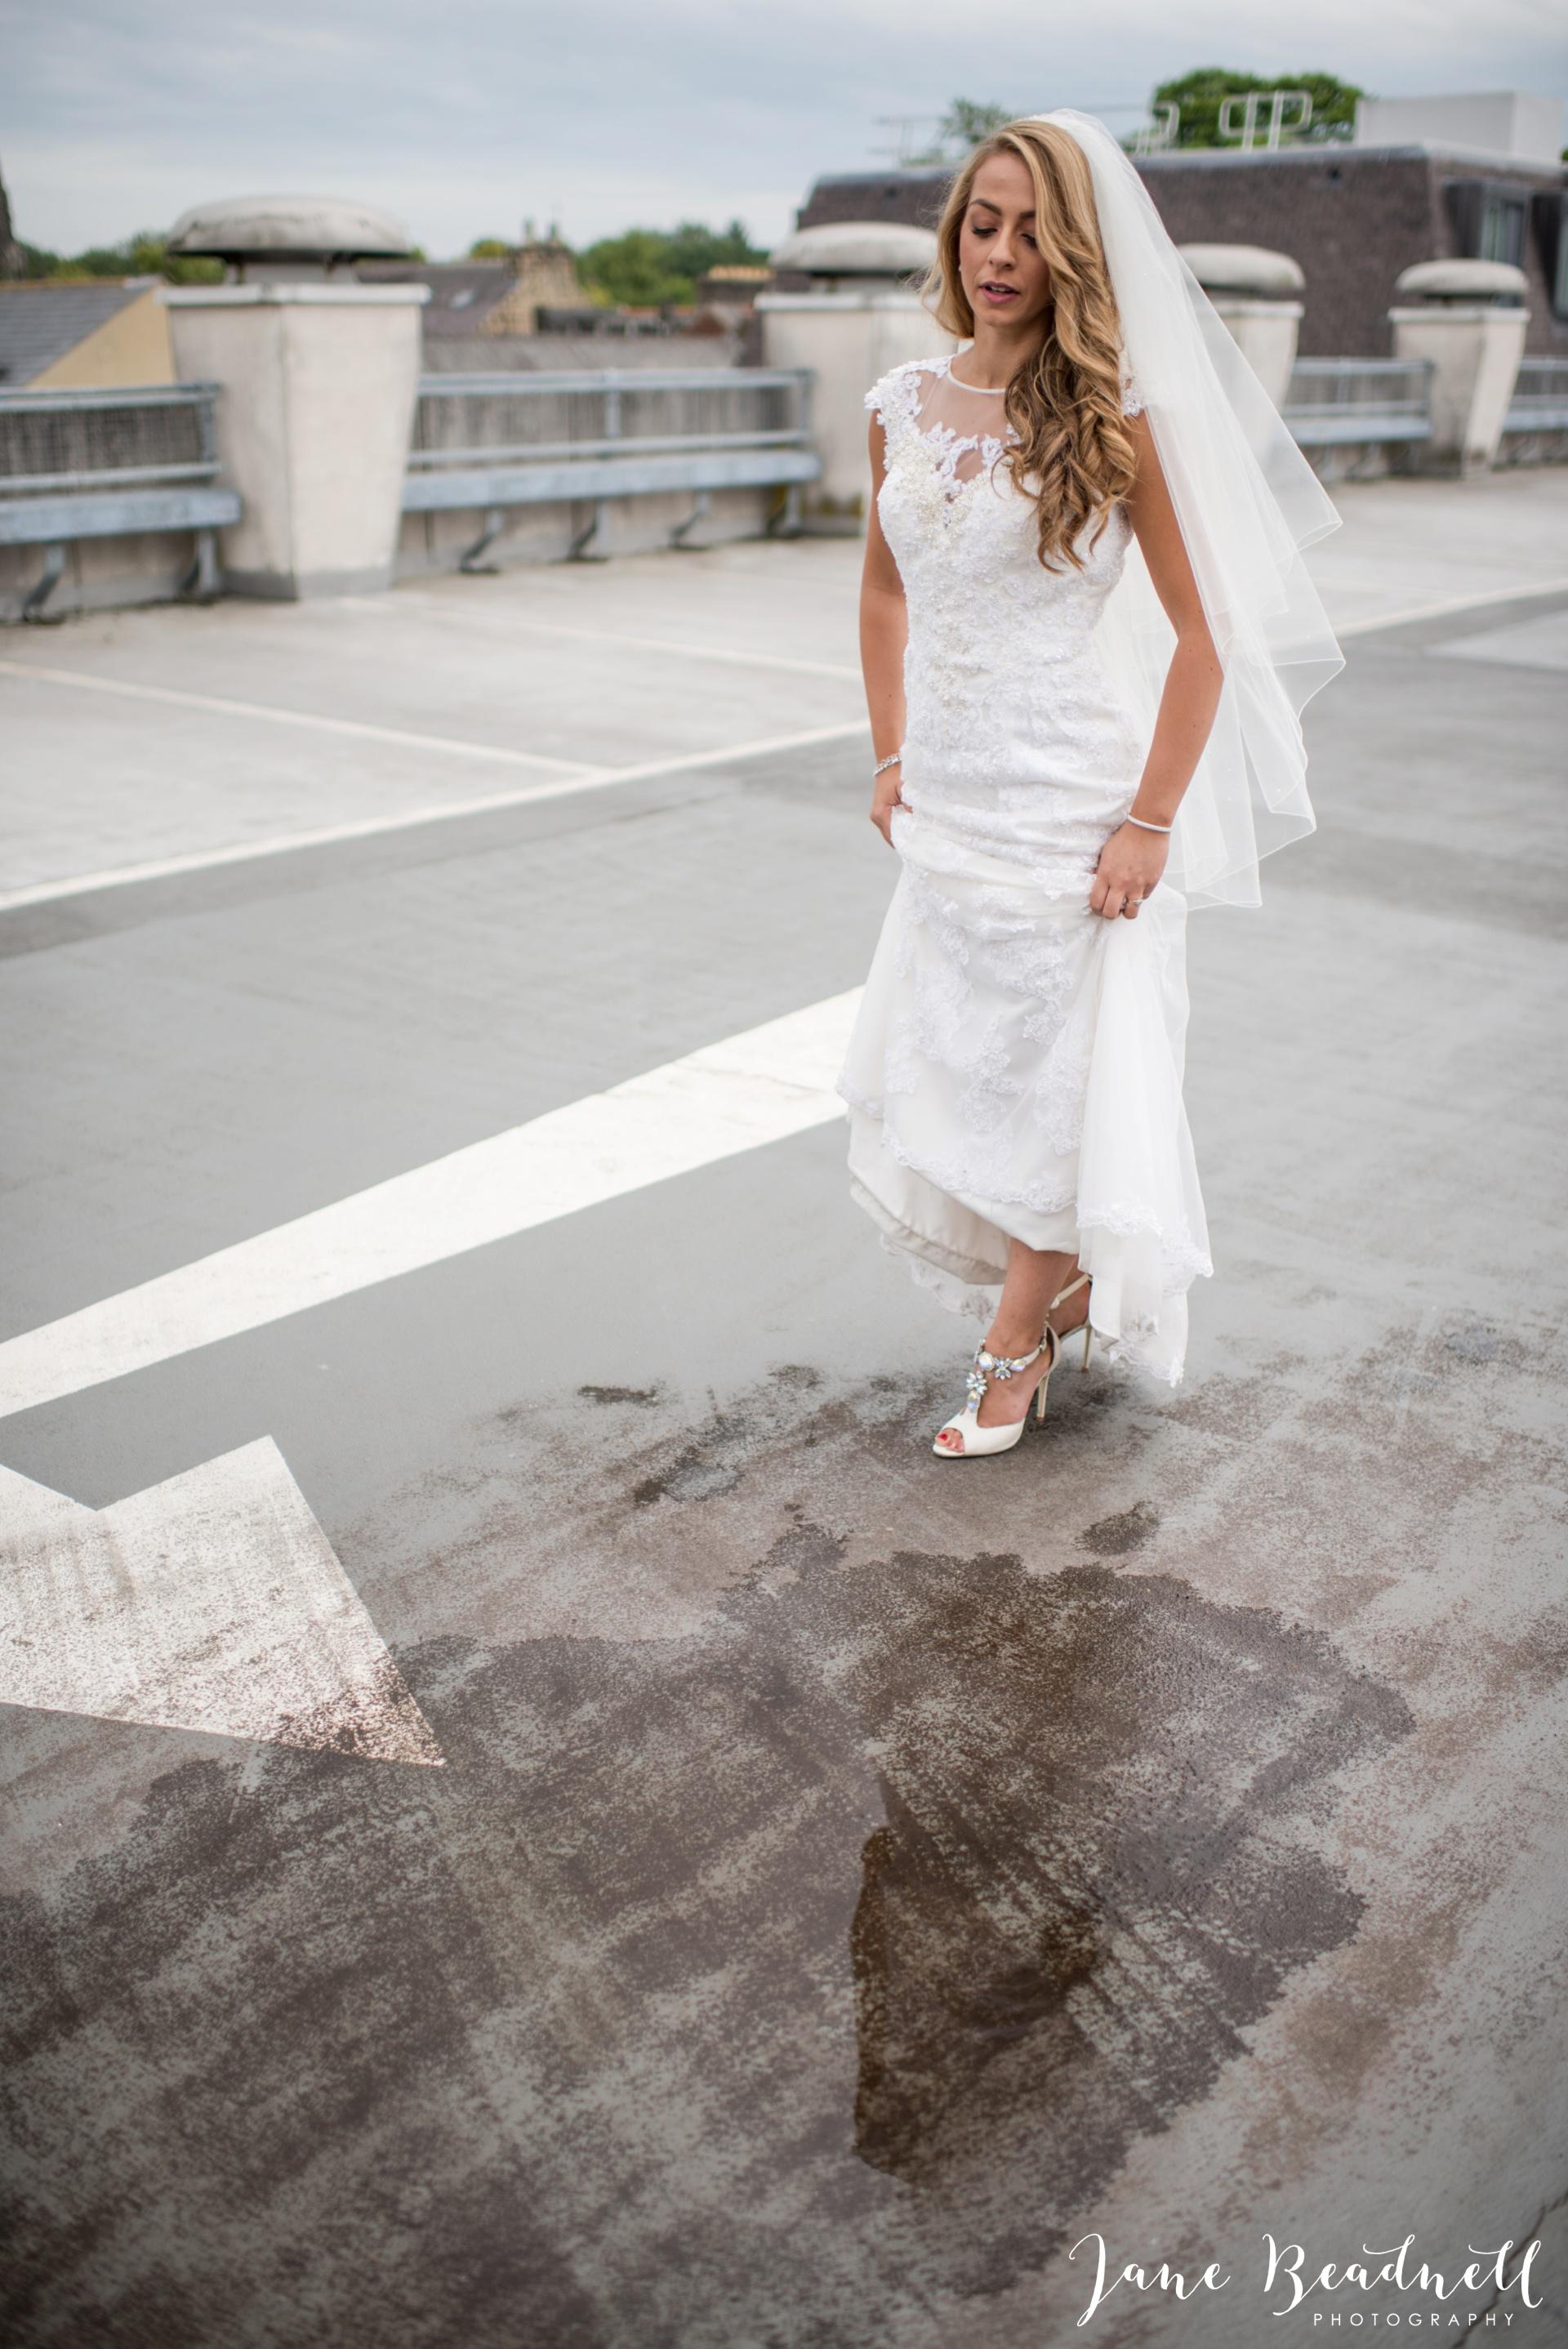 Jane Beadnell fine art wedding photographer Harrogate_0010